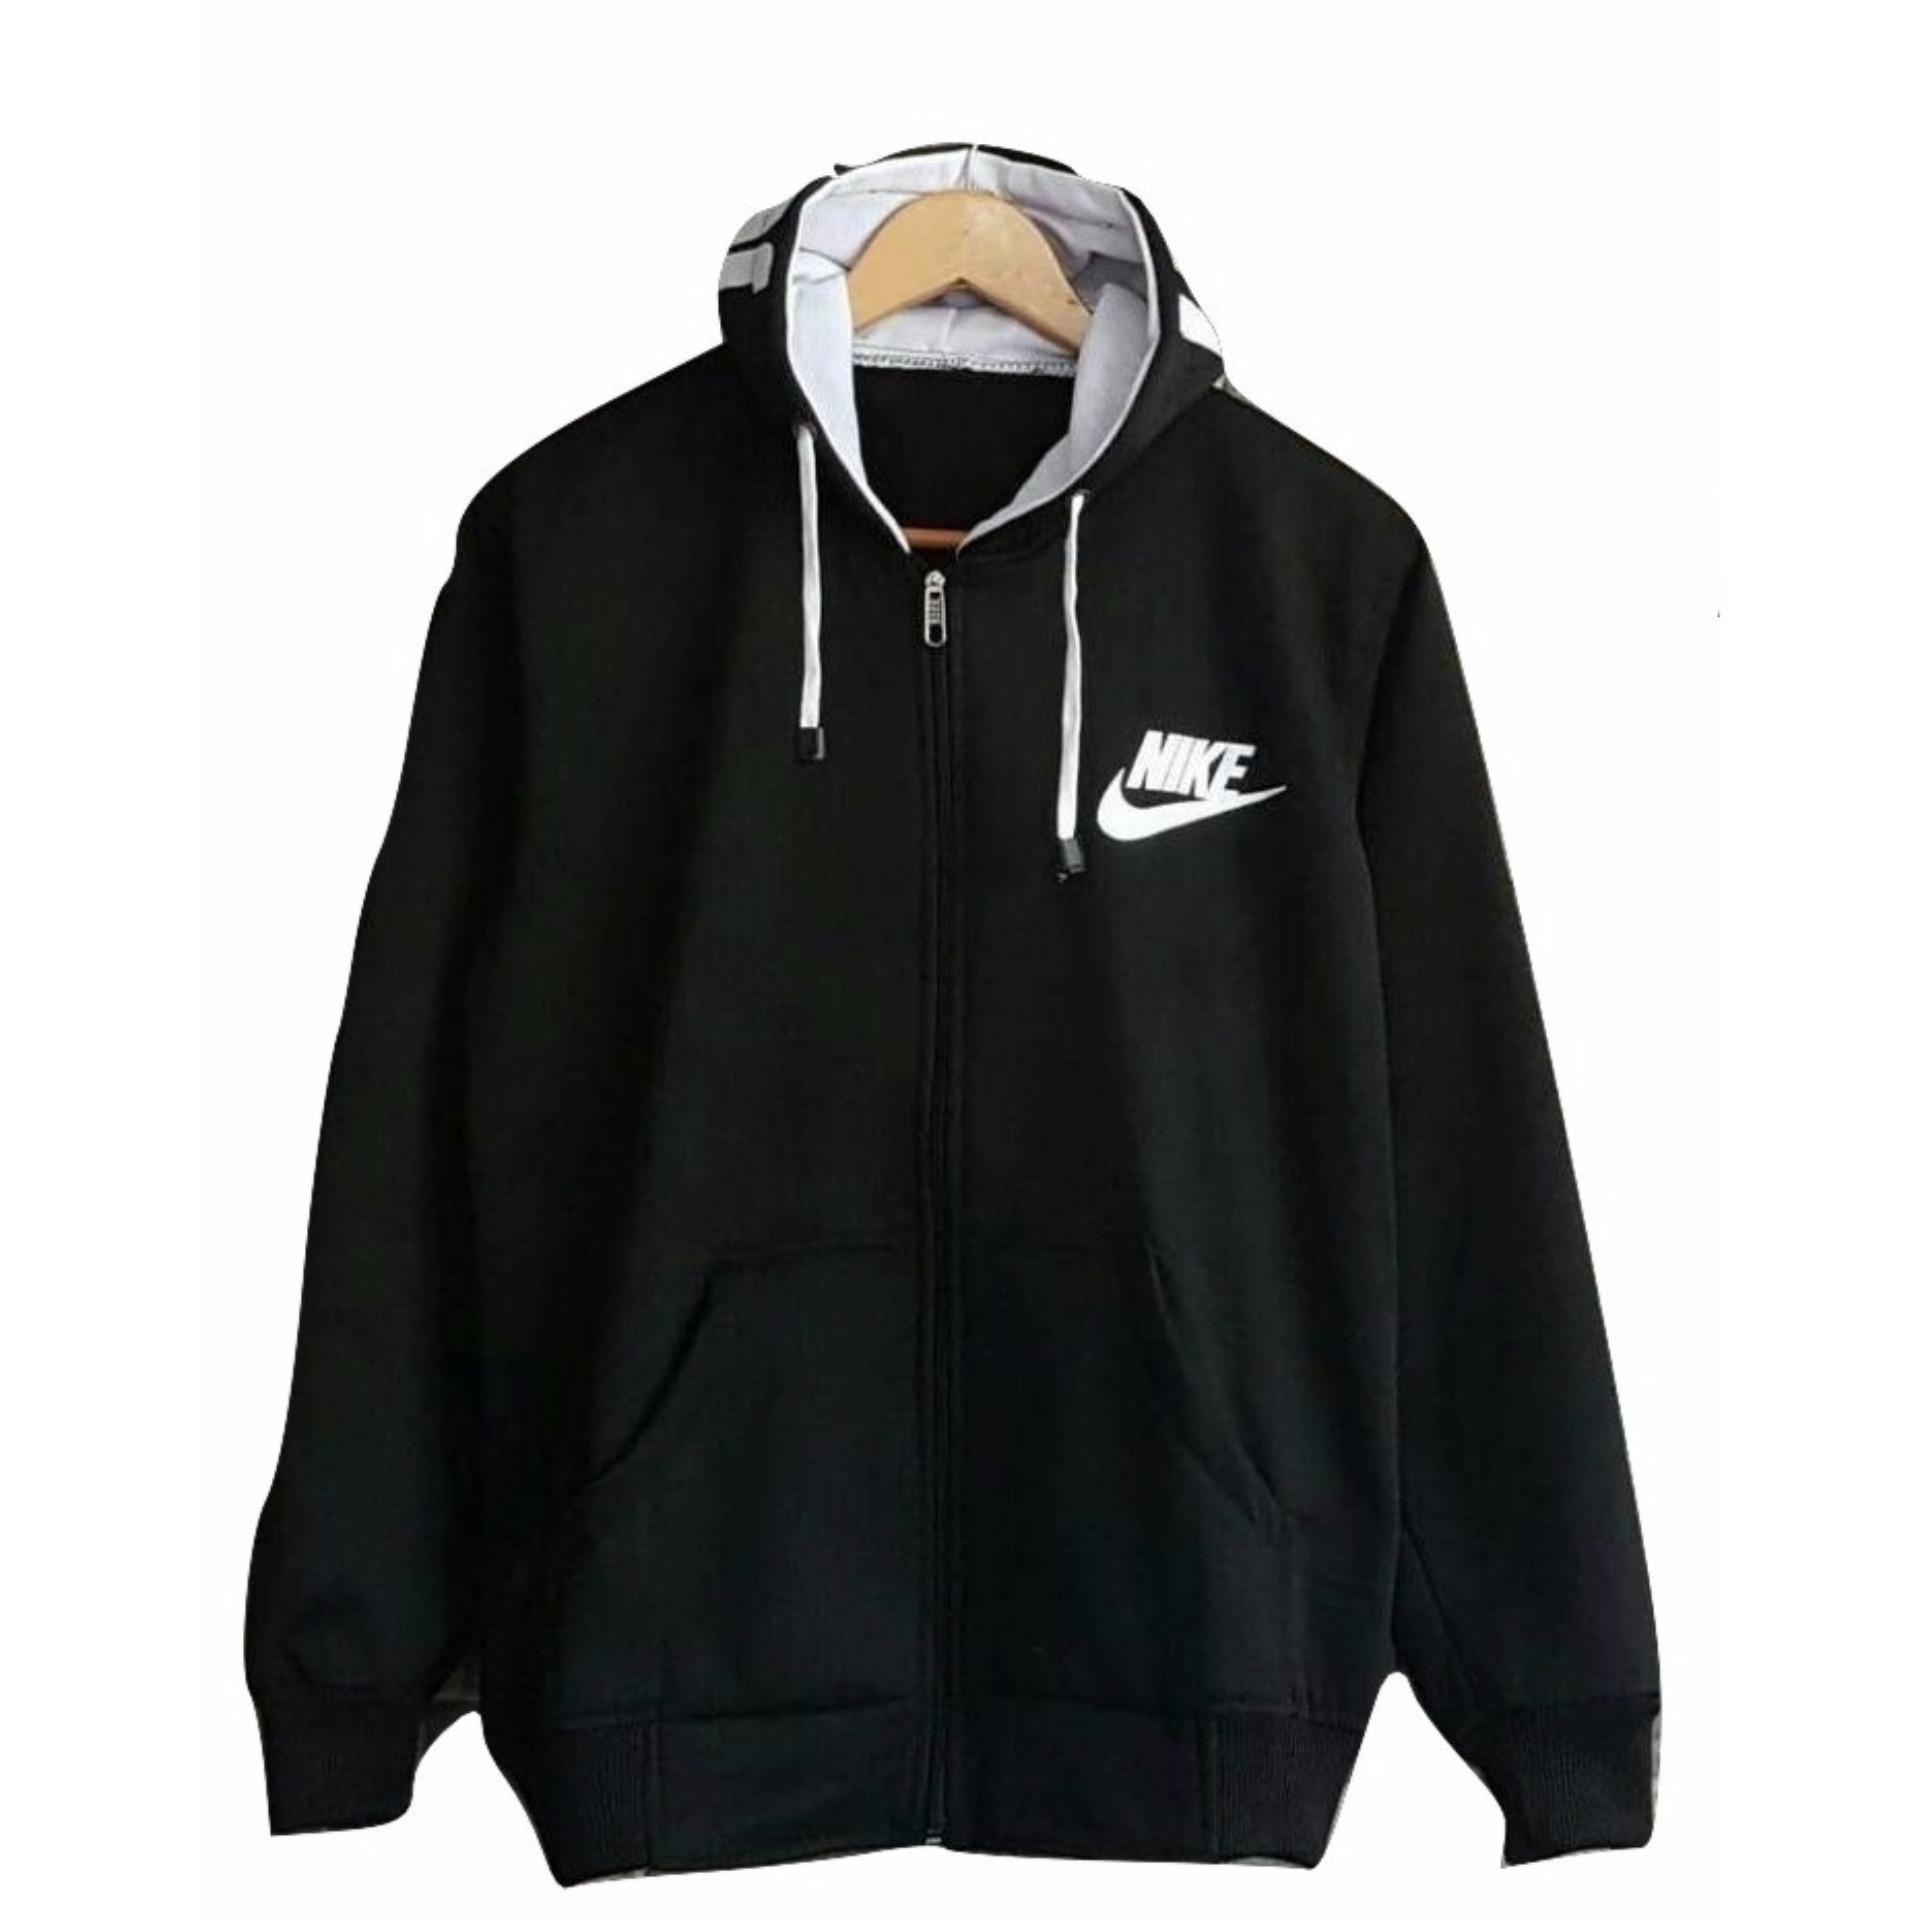 Kualitas Oke Sweater Pria Hodie - Sweater Hodie Text Black - Fleece